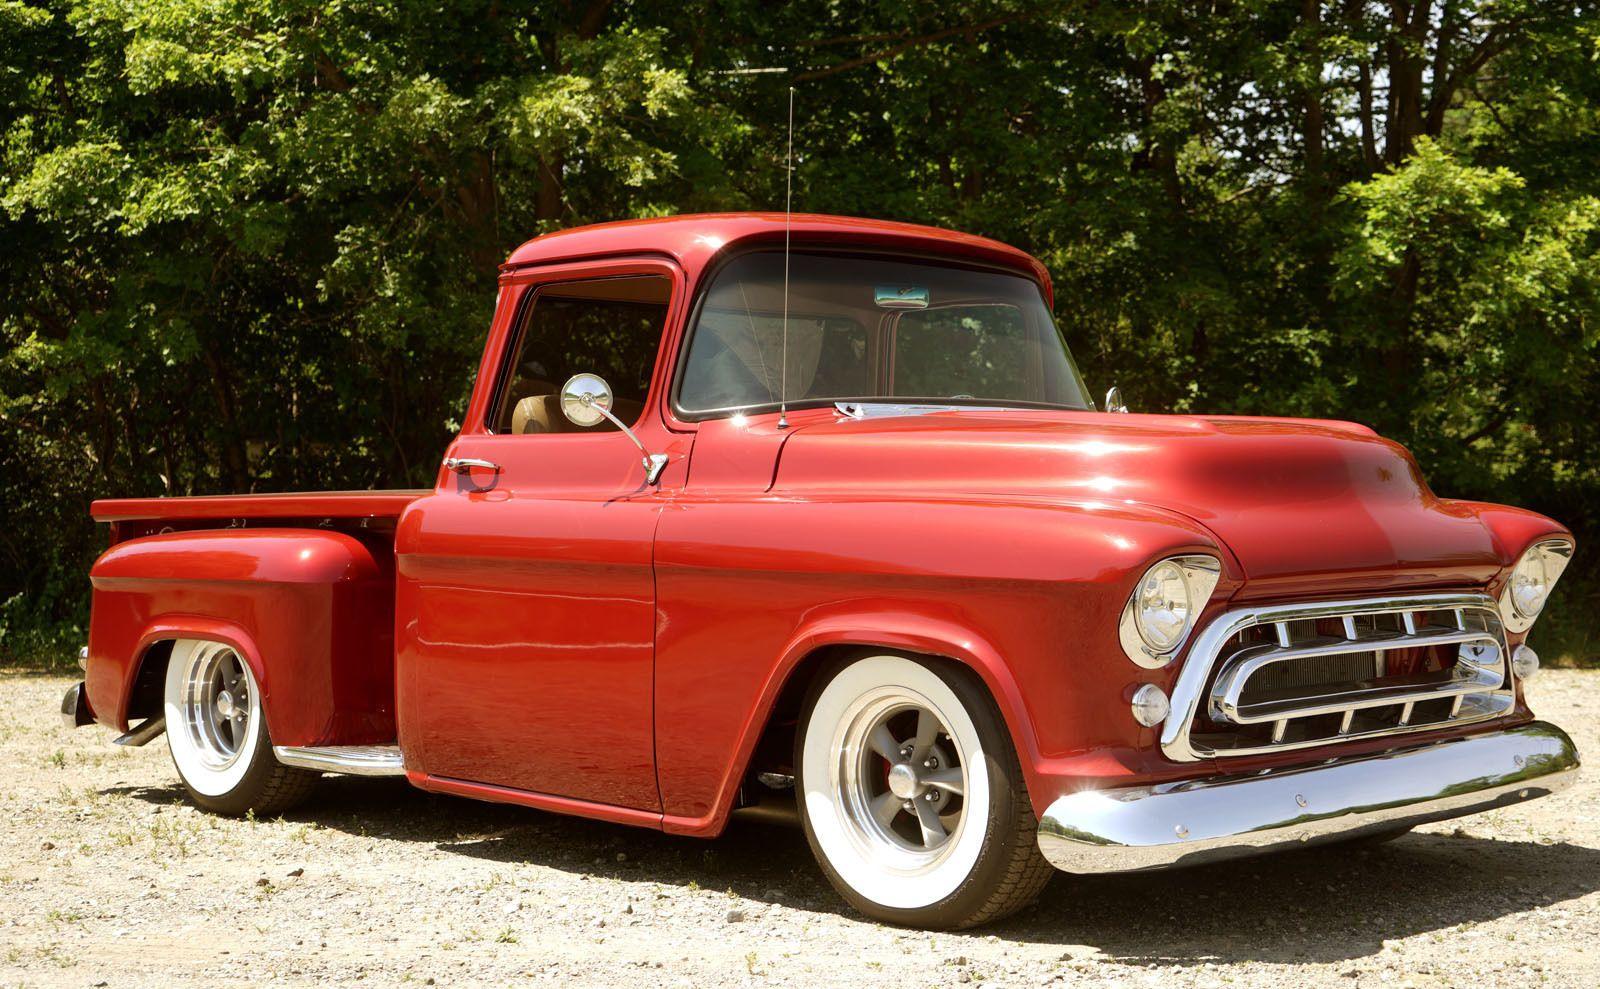 Truck 1957 chevy truck parts : Chevrolet: Other Pickups Big Block, Big Window Restored Show Truck ...